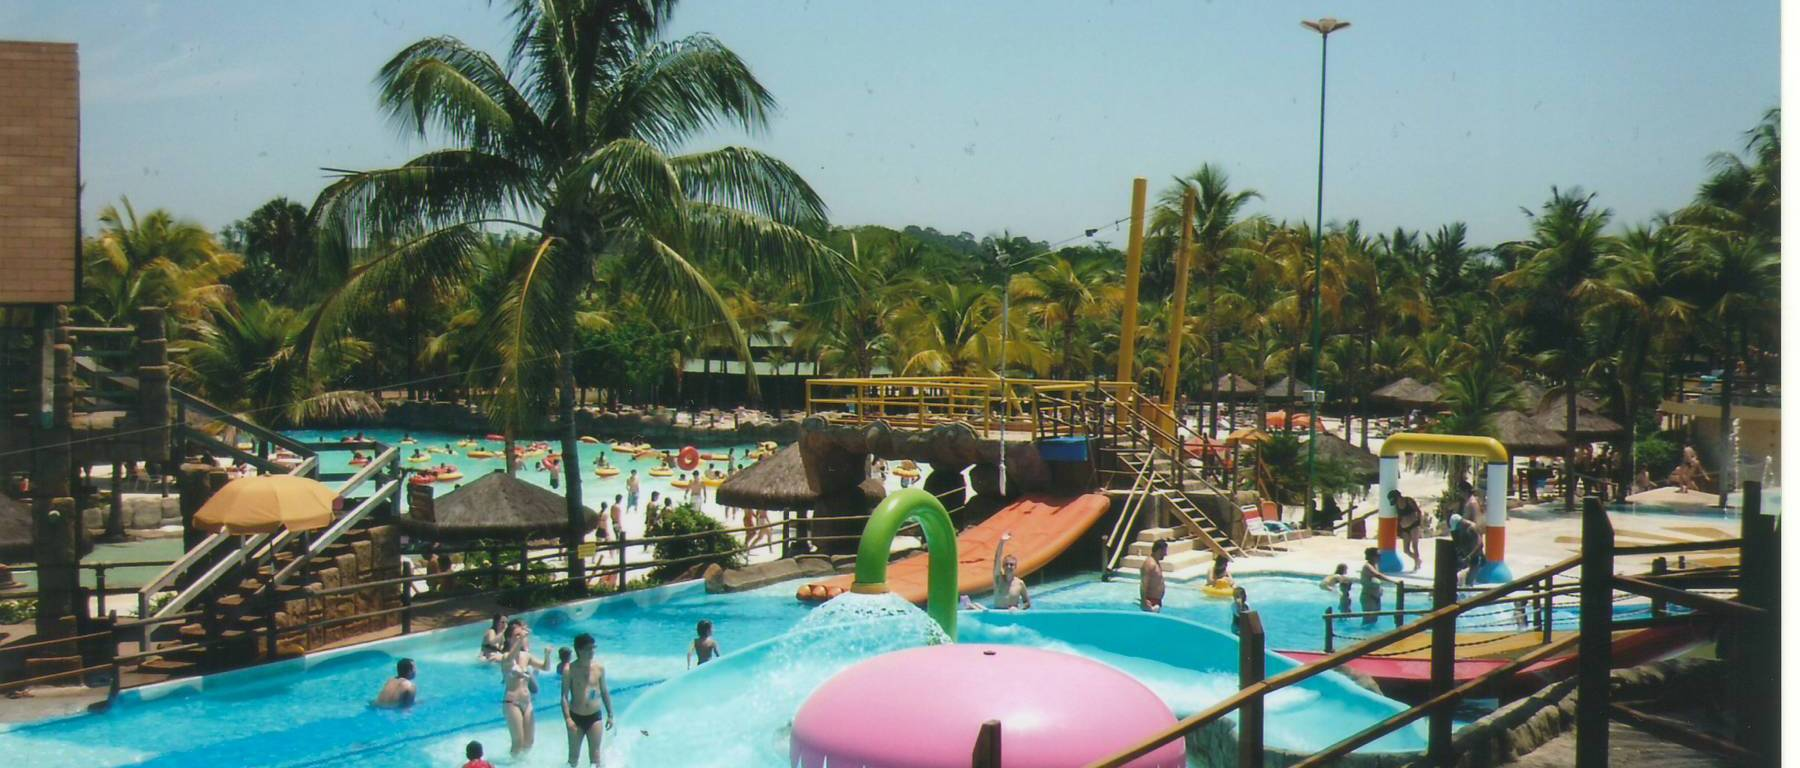 Parque Thermas dos Laranjais - Olimpia SP